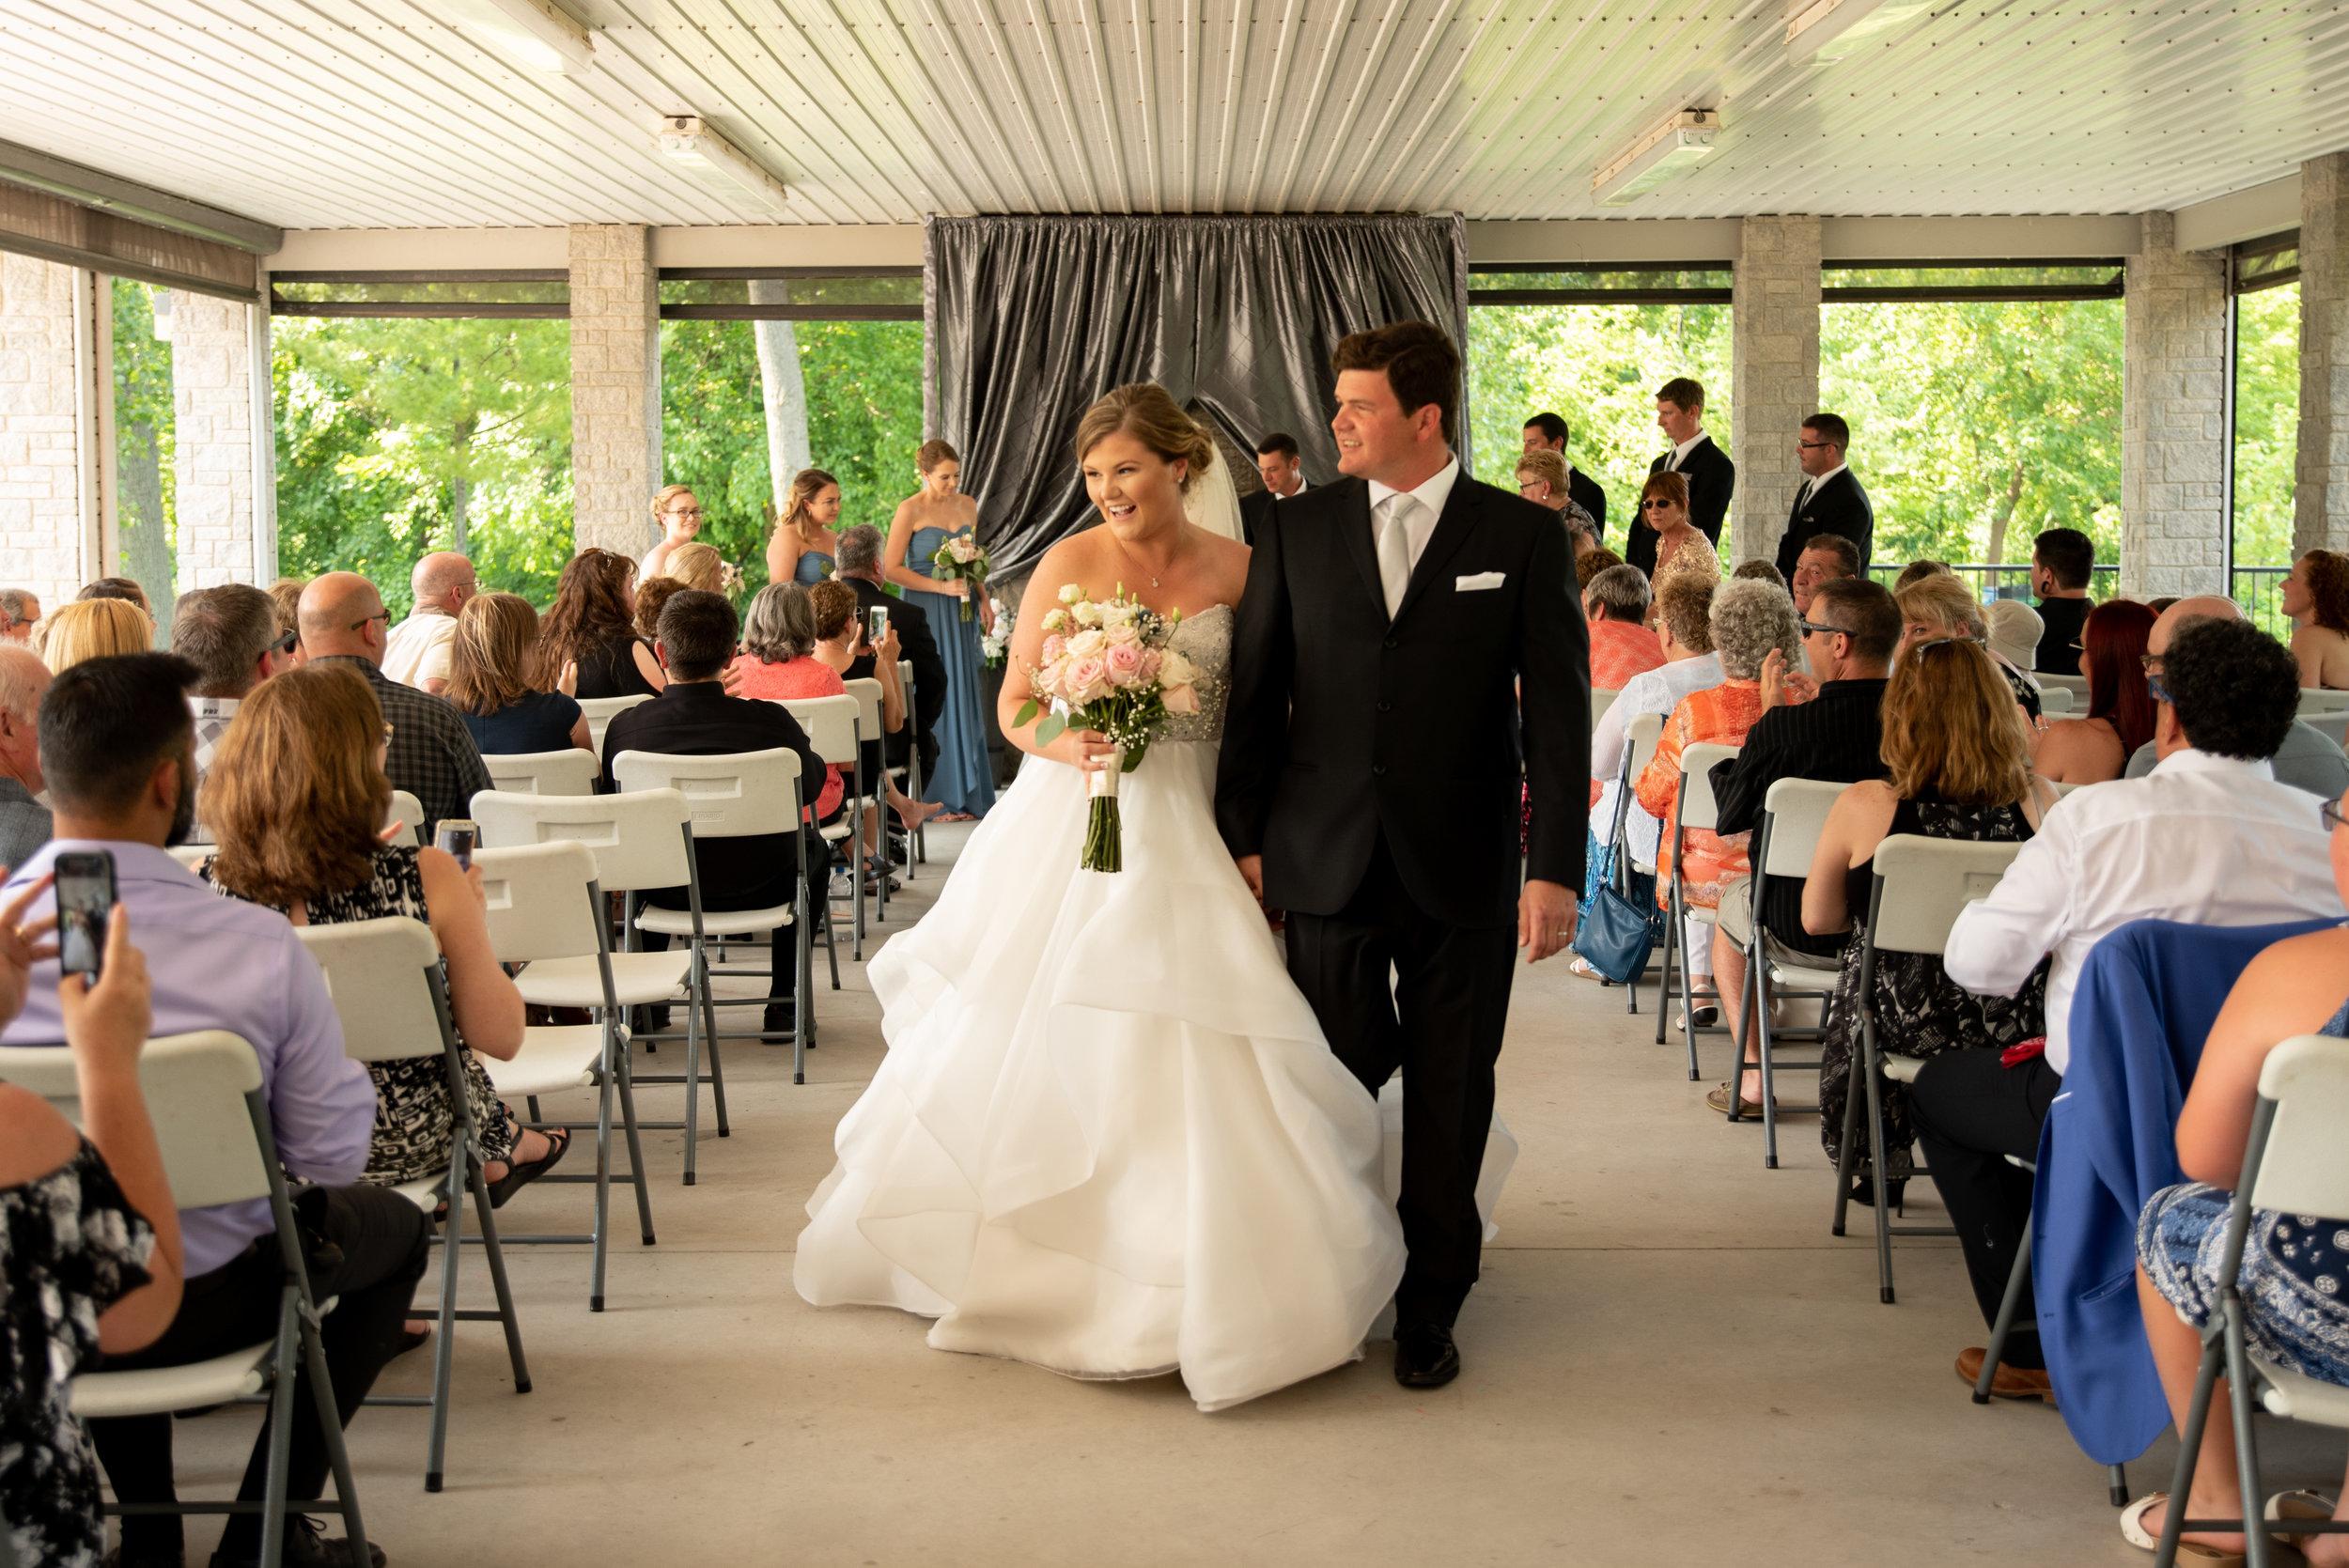 Summer wedding photographer Soundslikeyellowphotography